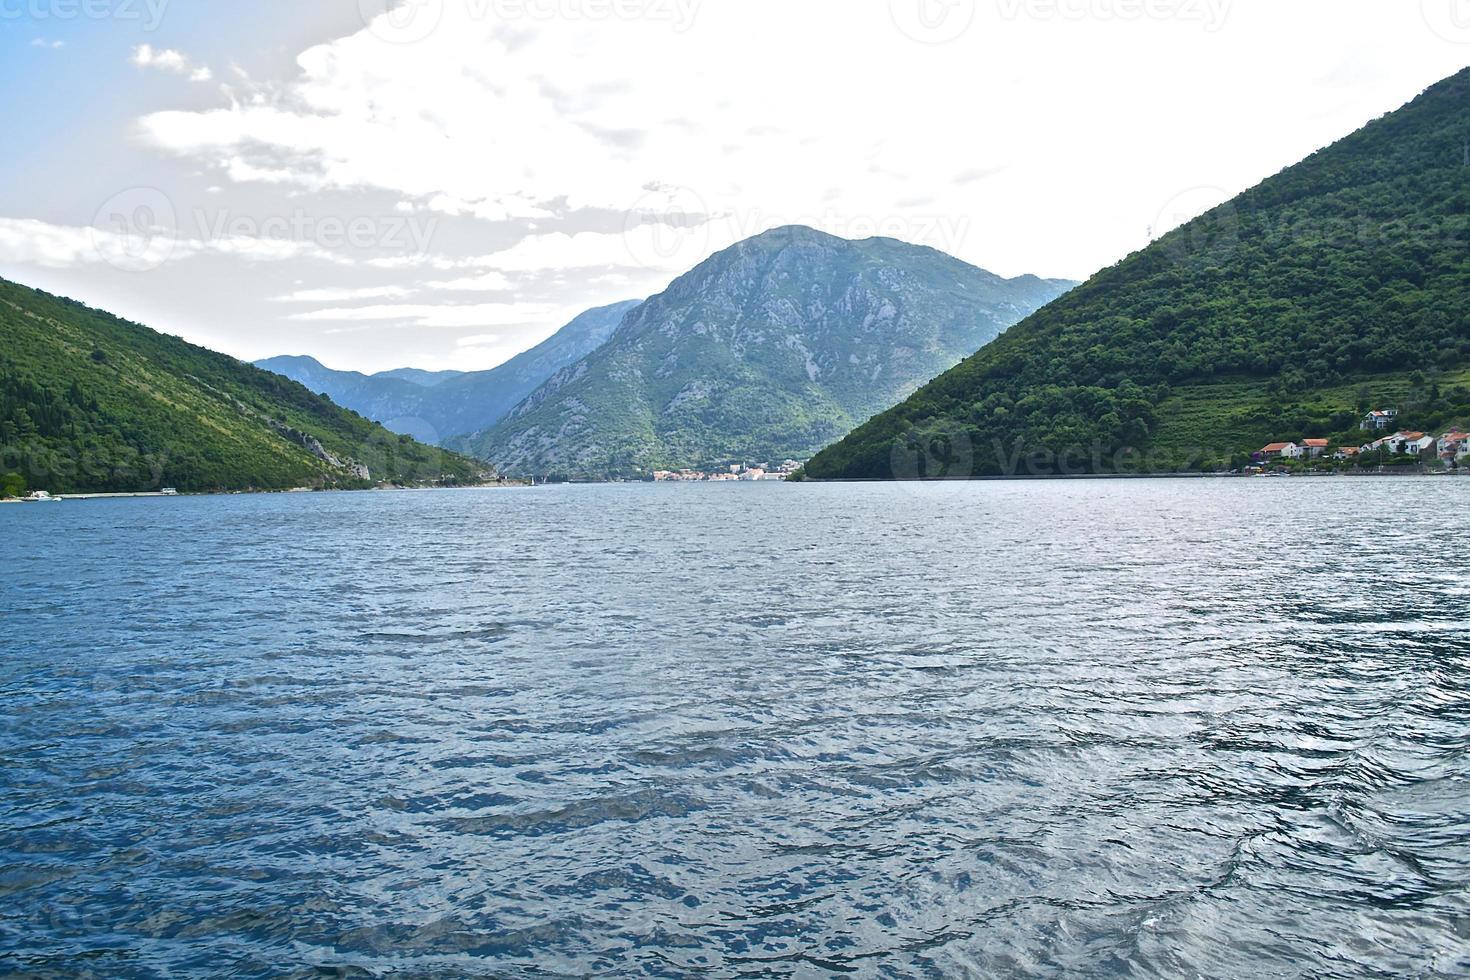 Bay of Kotor (Boka) photo